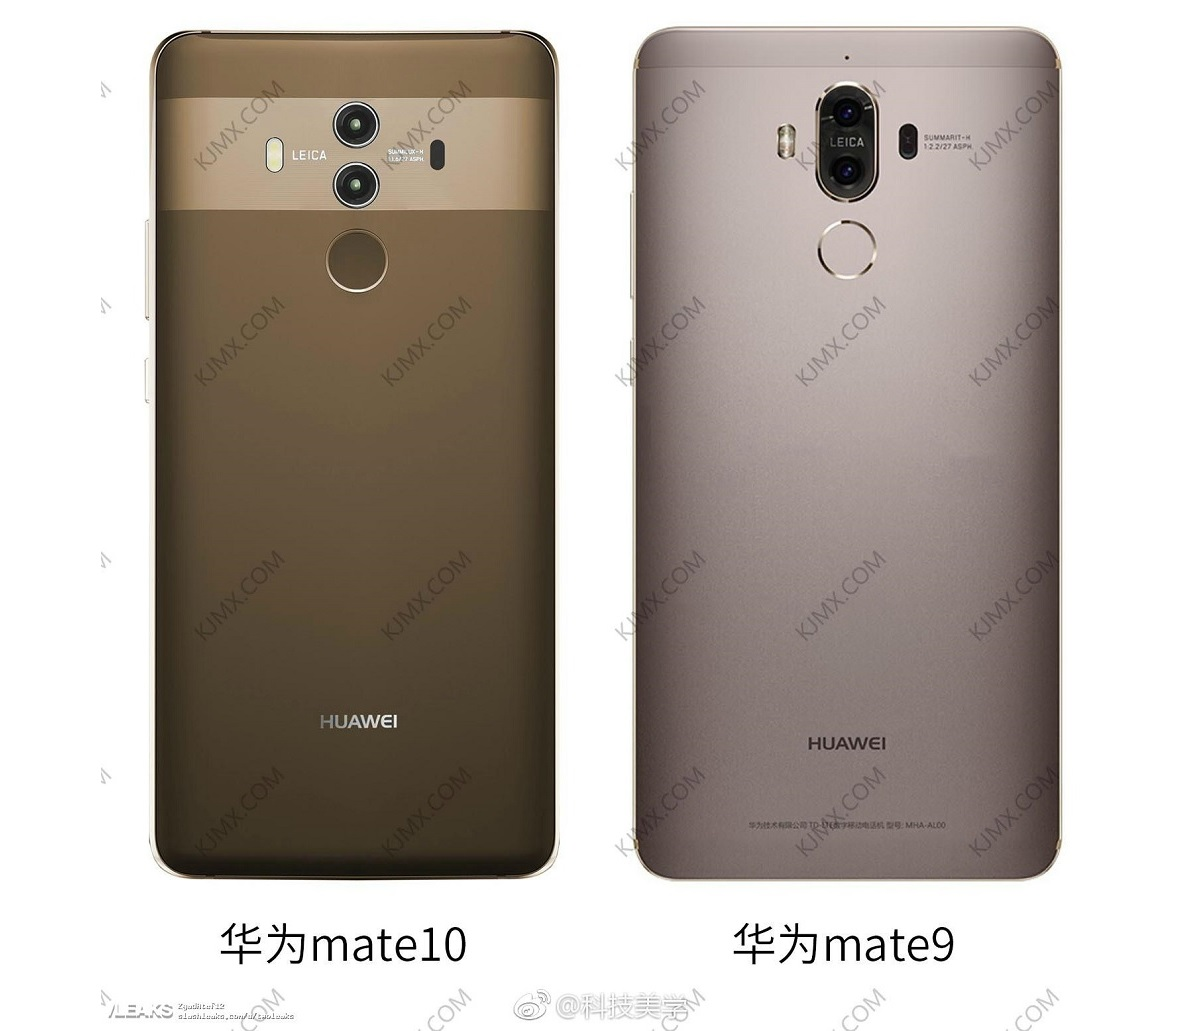 Huawei Mate 10 Pro vs. Huawei Mate 9 Pro: diferencias en sus diseños